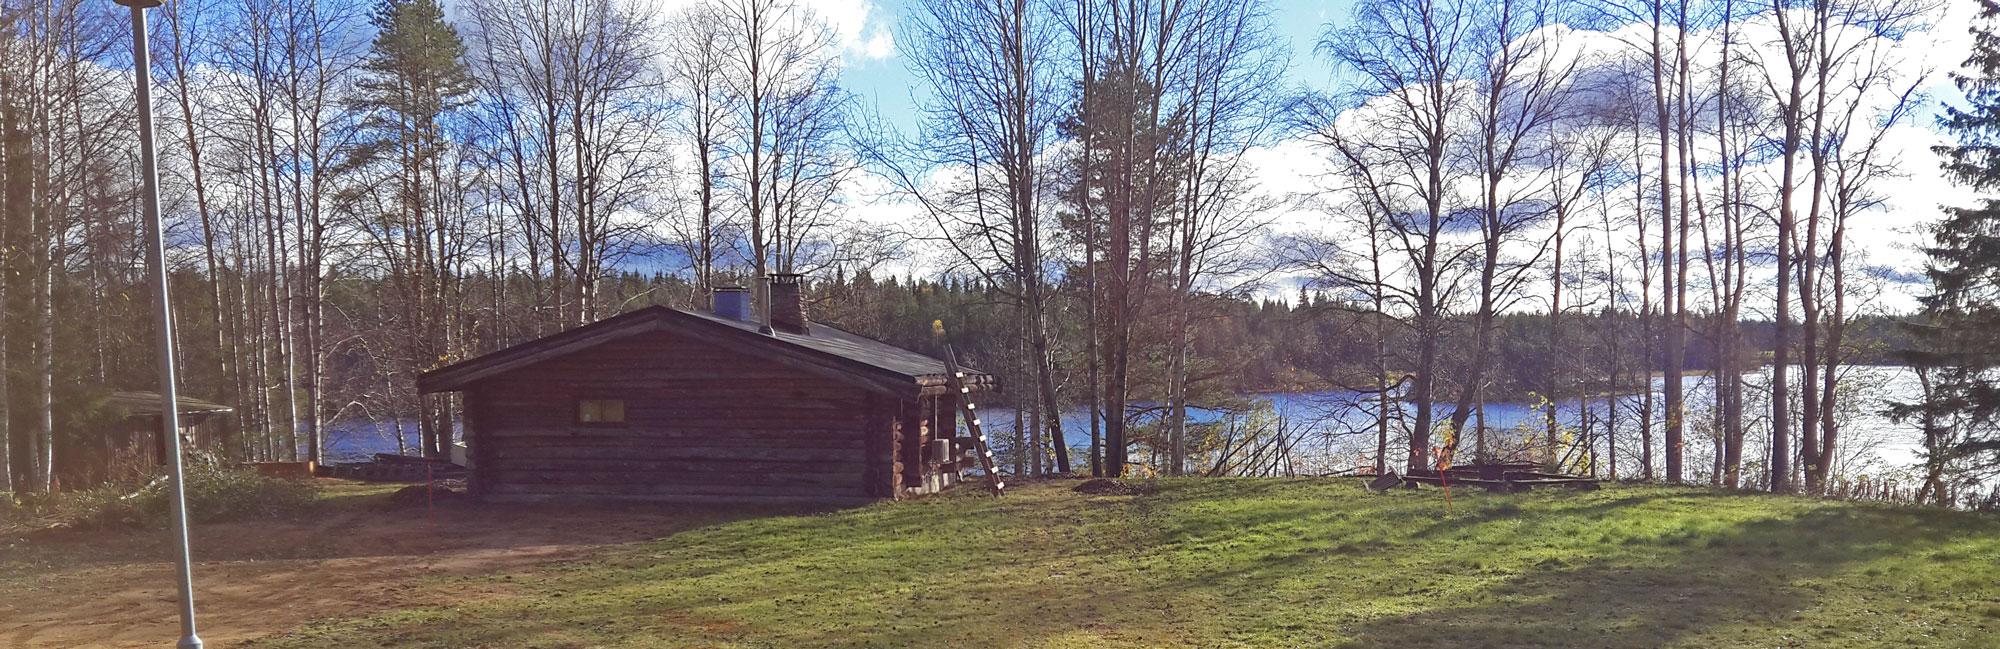 Sieripirtti Rovaniemi juhlatilat